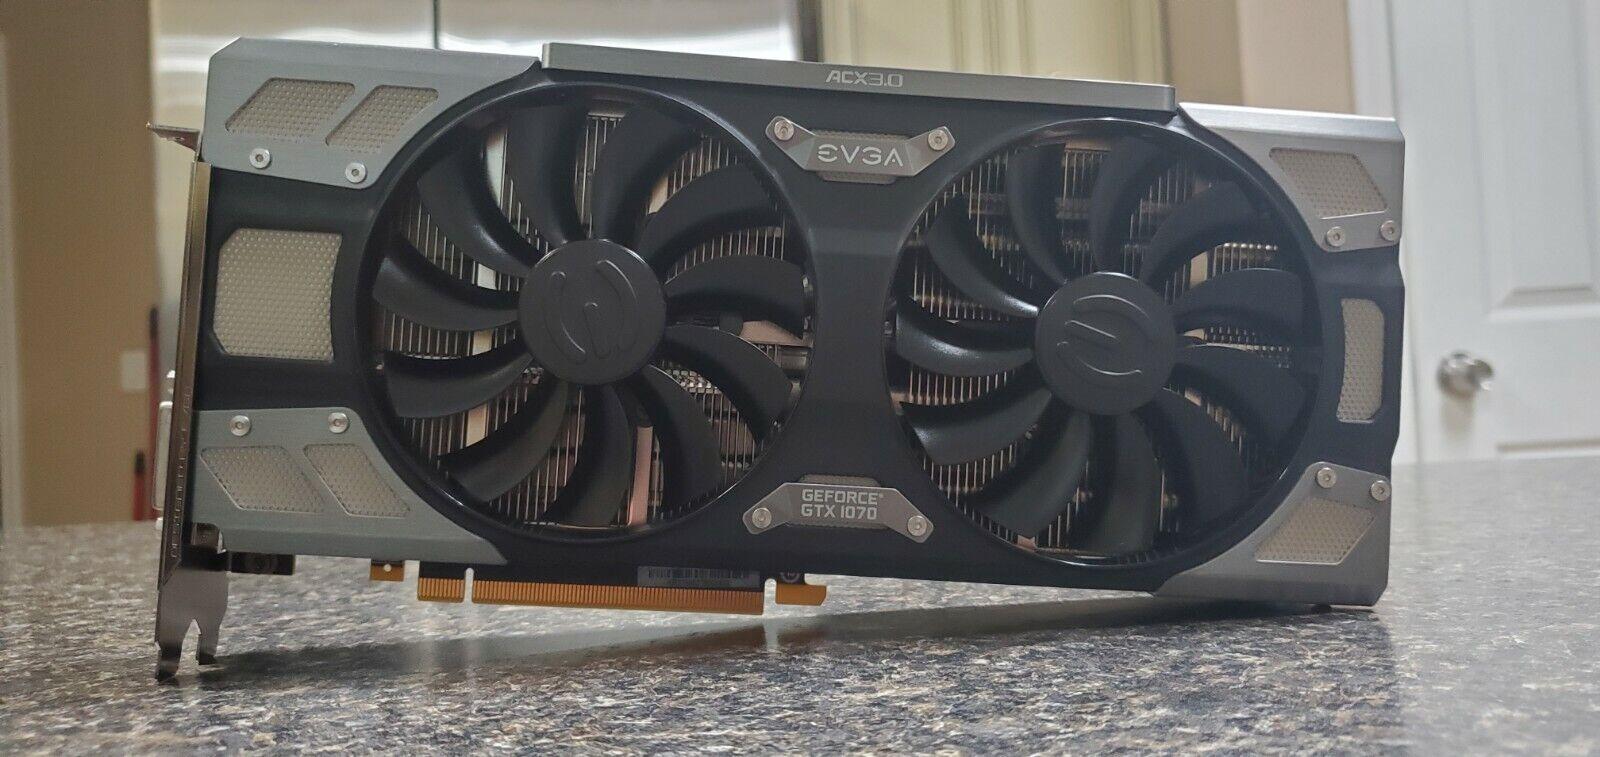 EVGA NVIDIA GeForce GTX 1070 FTW ゲーミング 8GB GDDR 5 グラフィックカード (08G